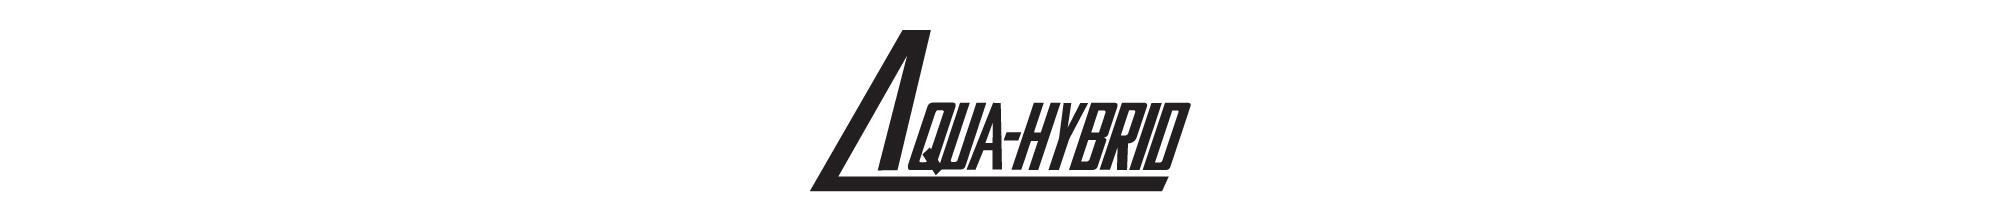 AQUA-HYBRID-swimwear